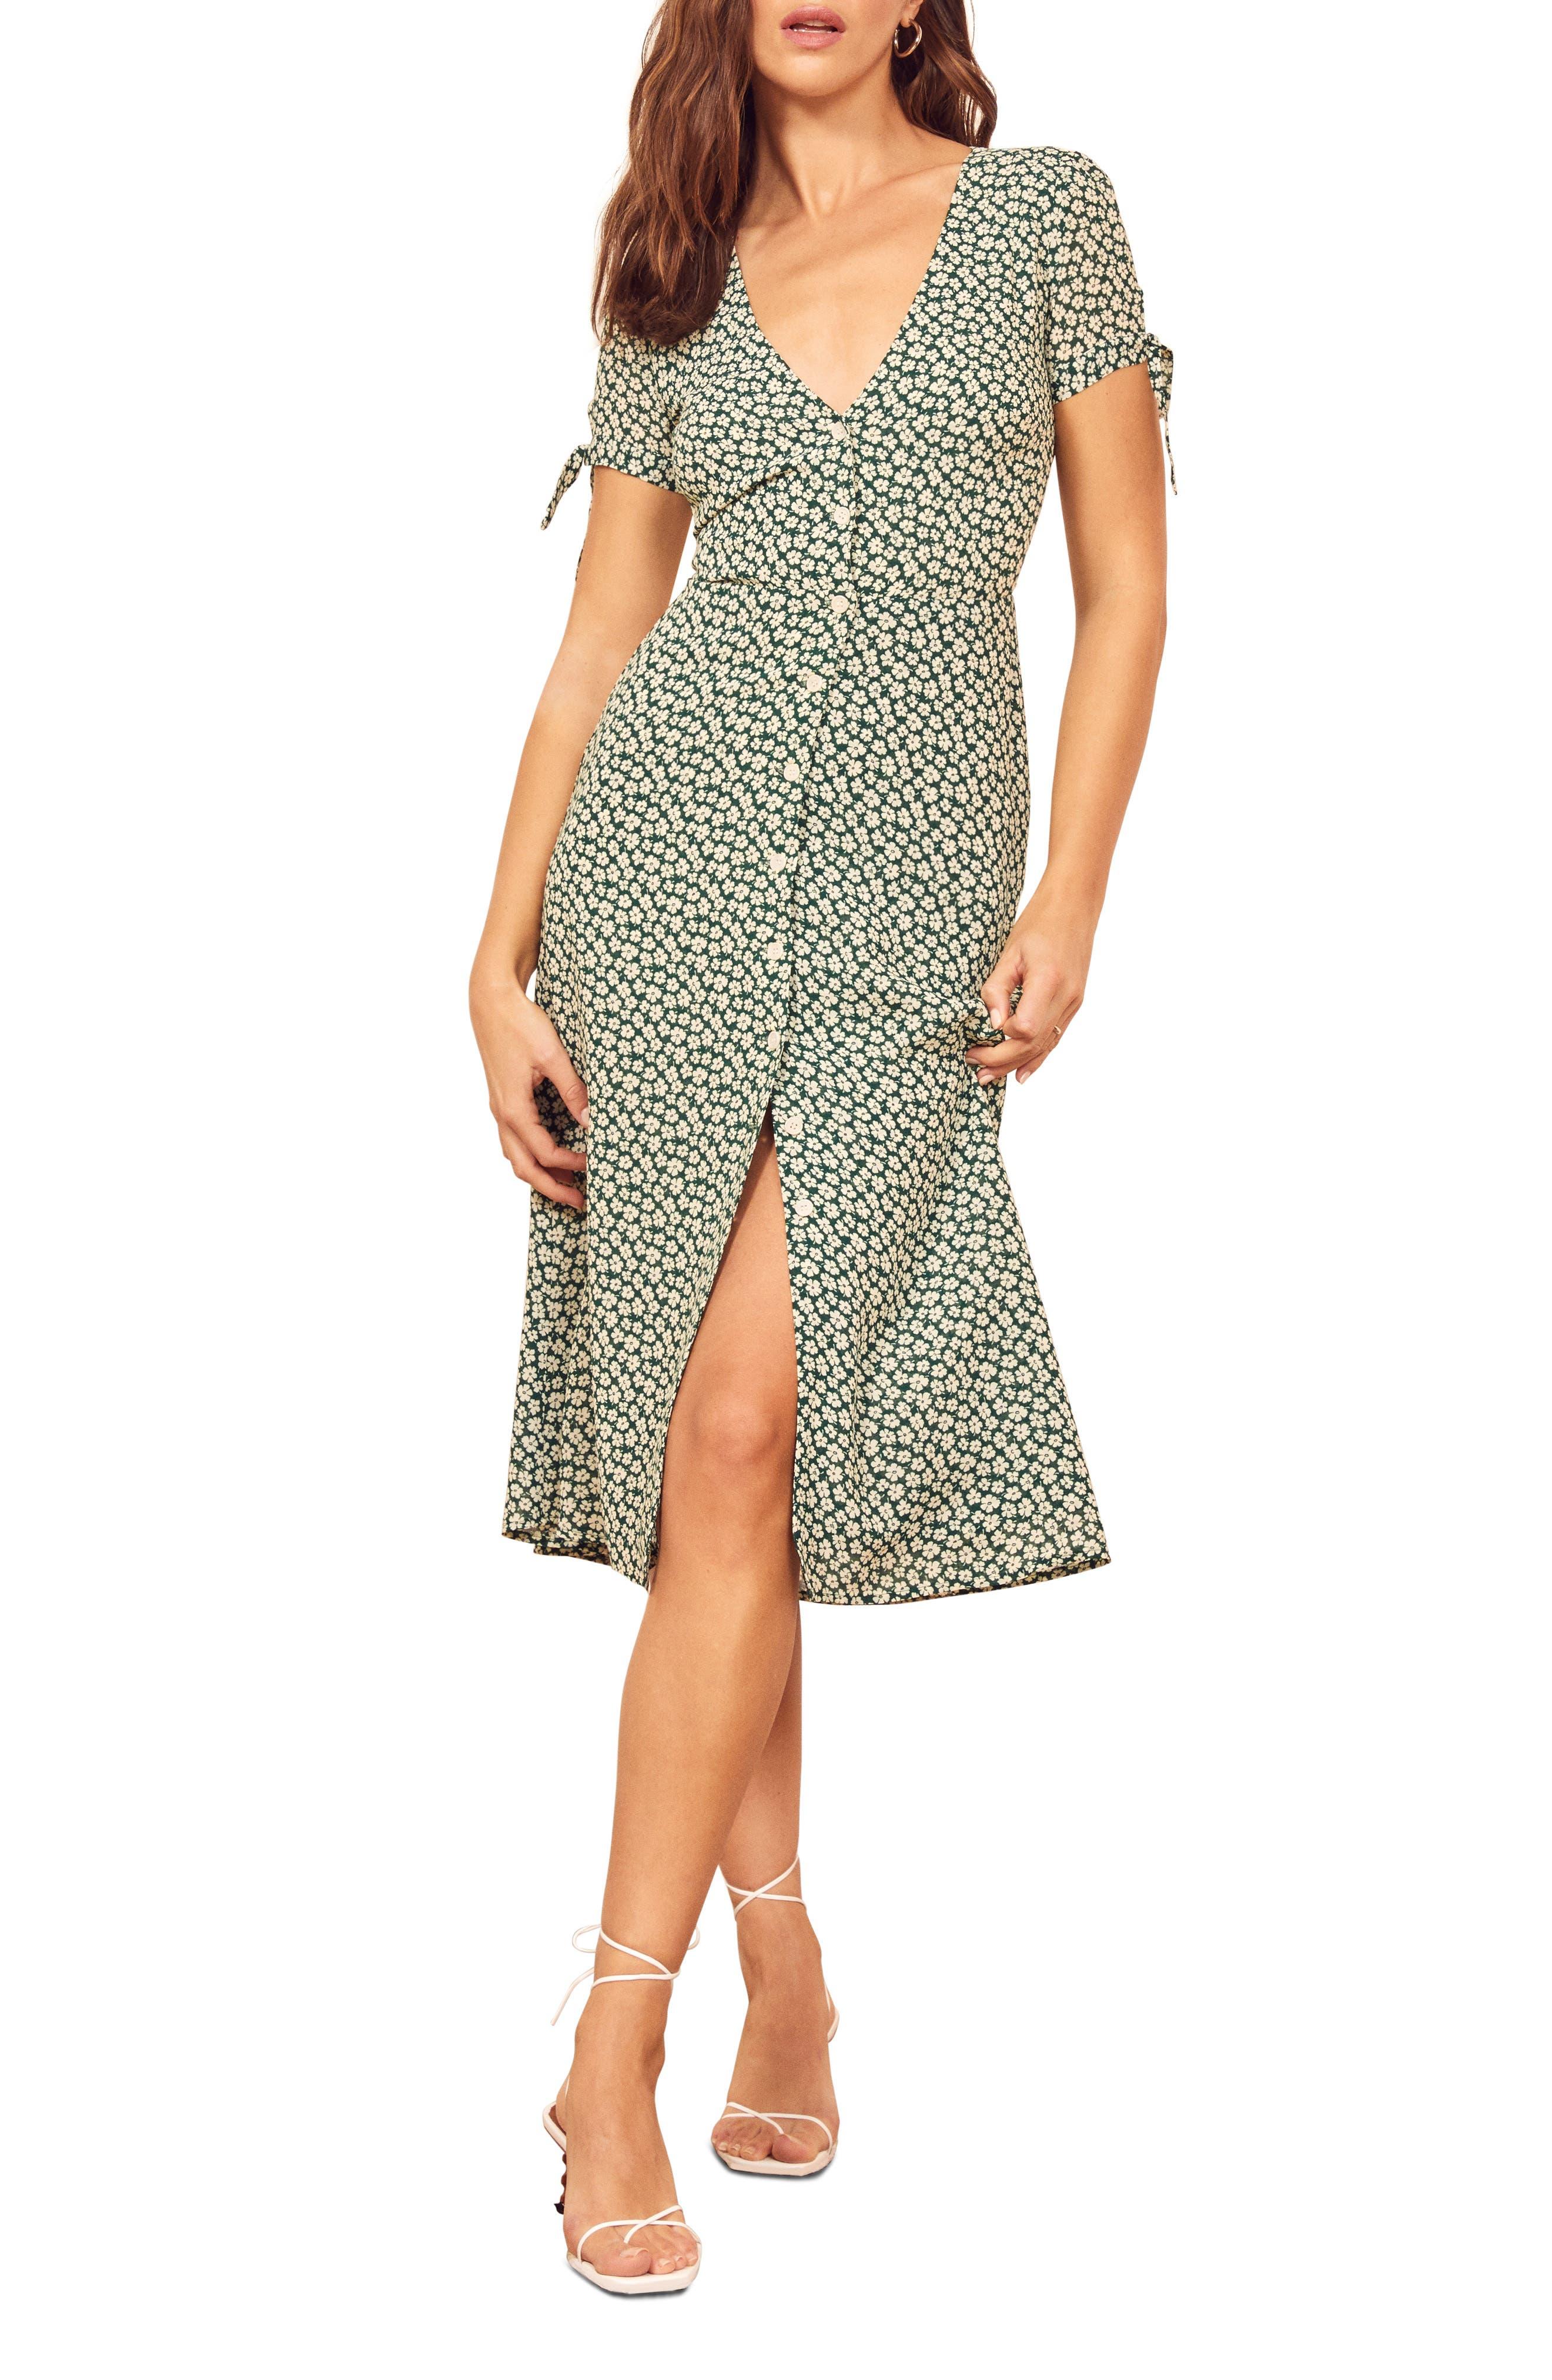 Reformation Rosalinda Floral Tie Sleeve Dress, Green